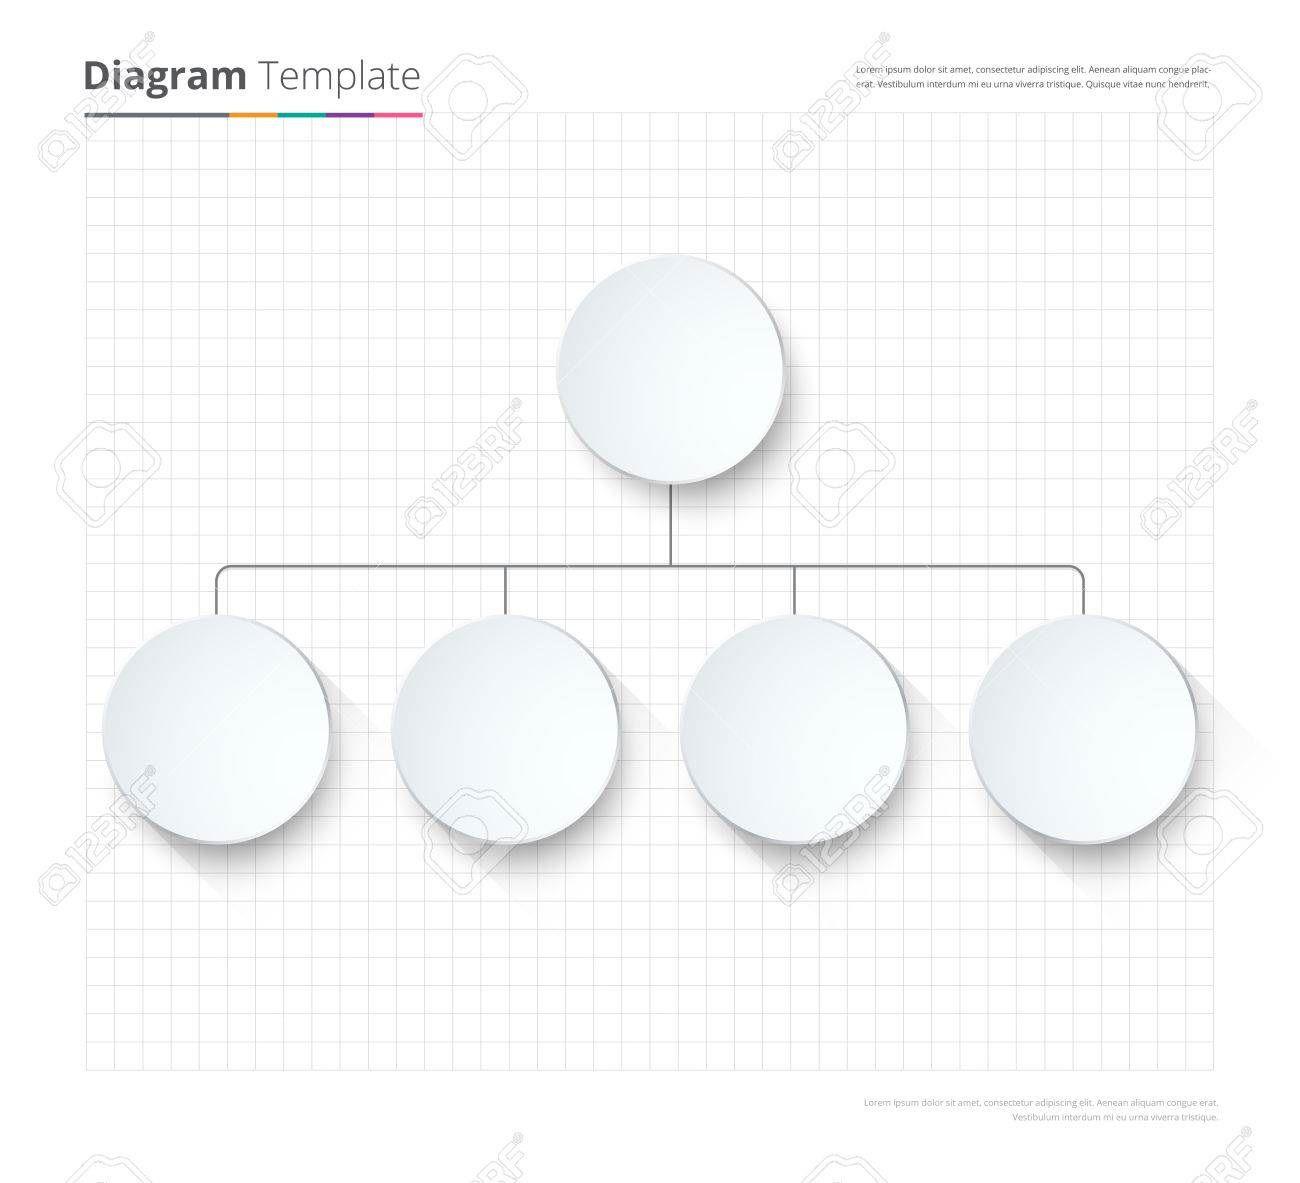 Blank Flow Chart Template ~ Addictionary